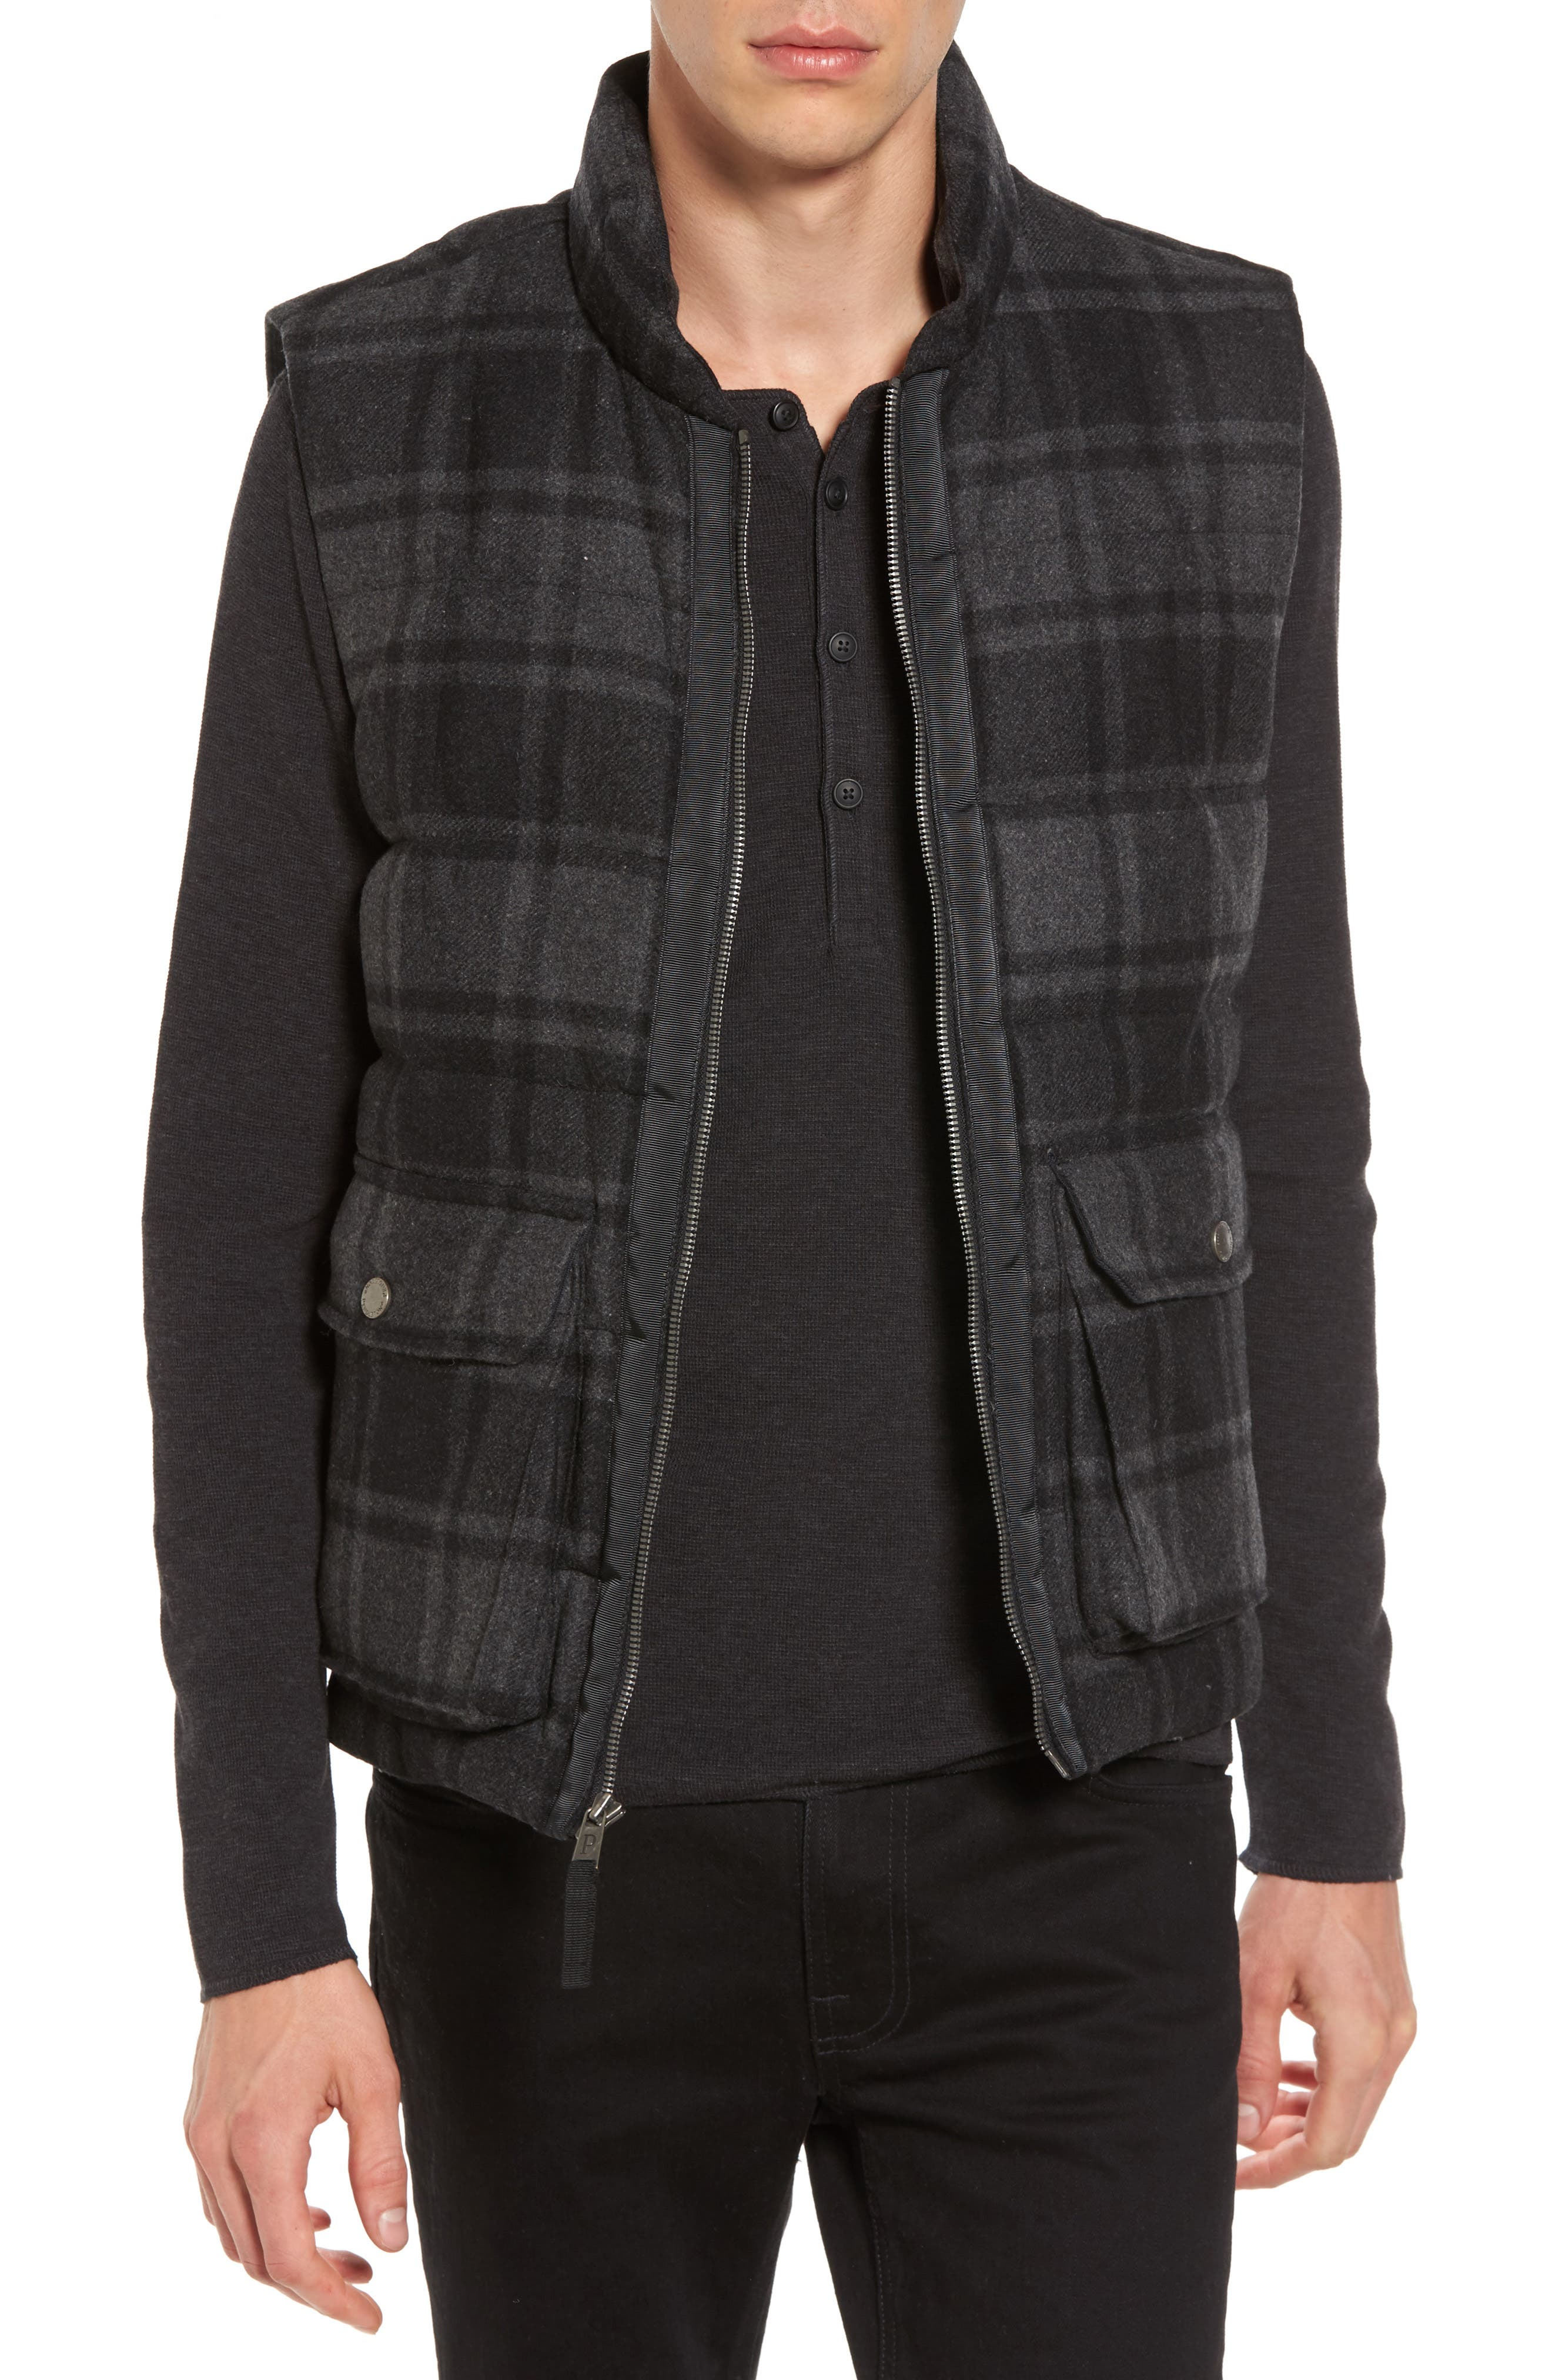 Yosemite Jacket,                         Main,                         color, Black/ Charcoal Plaid